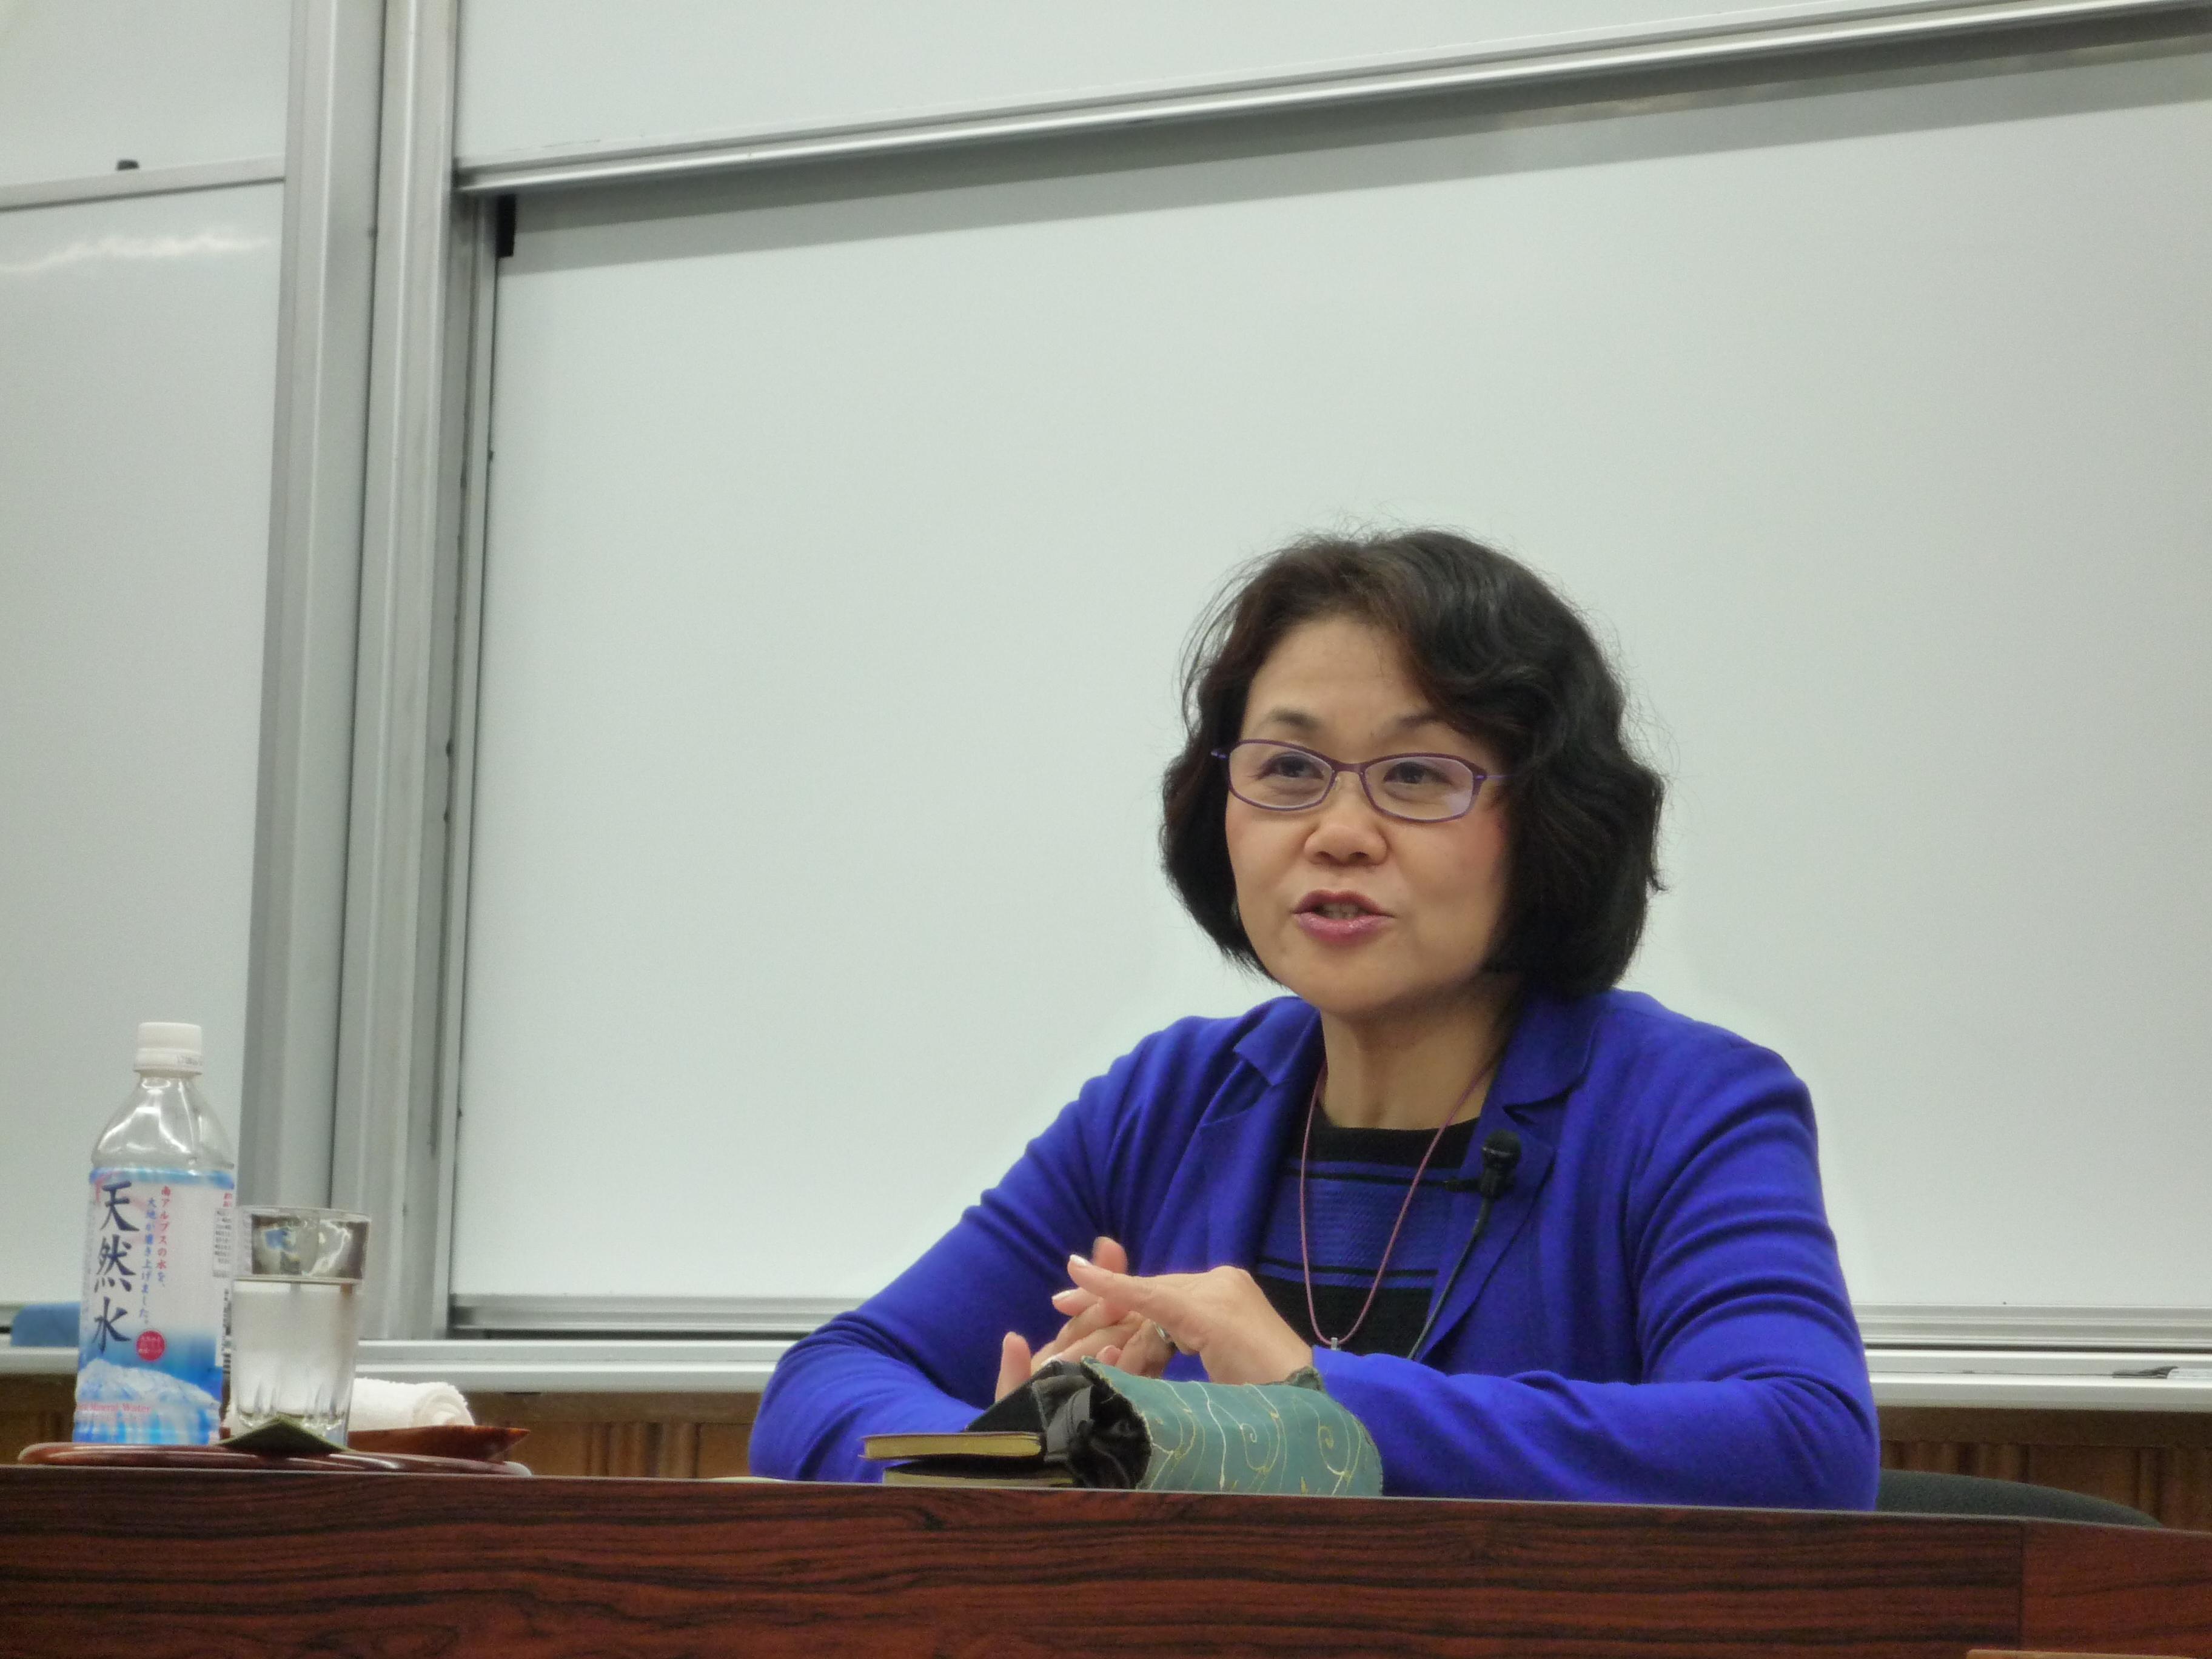 http://www.shinshu-u.ac.jp/faculty/econlaw/topics/images/271214%E7%8F%BE%E6%B3%952_2%E5%8F%B3_%E4%BA%BA%E7%89%A9.JPG